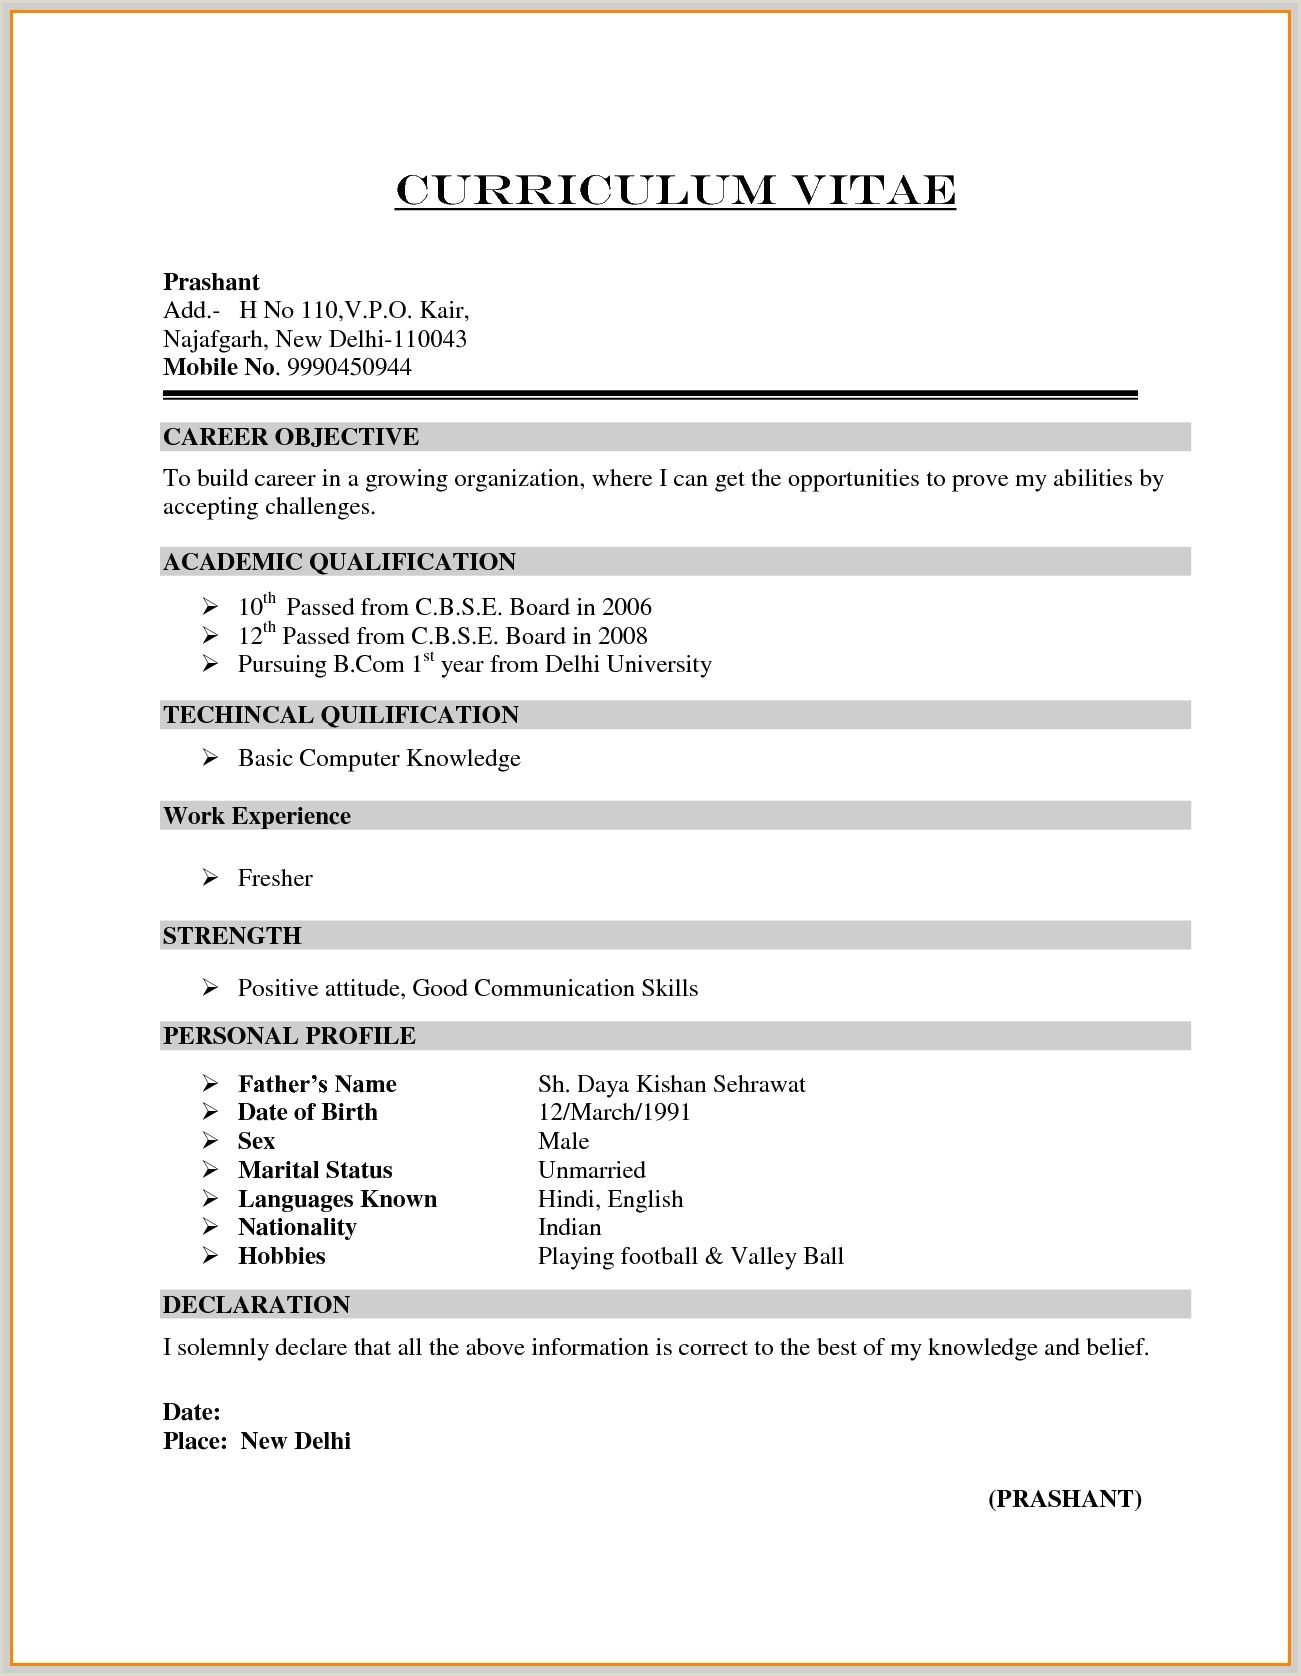 Fresher Cv Format Pakistan Image Result For Resume Format For B Freshers